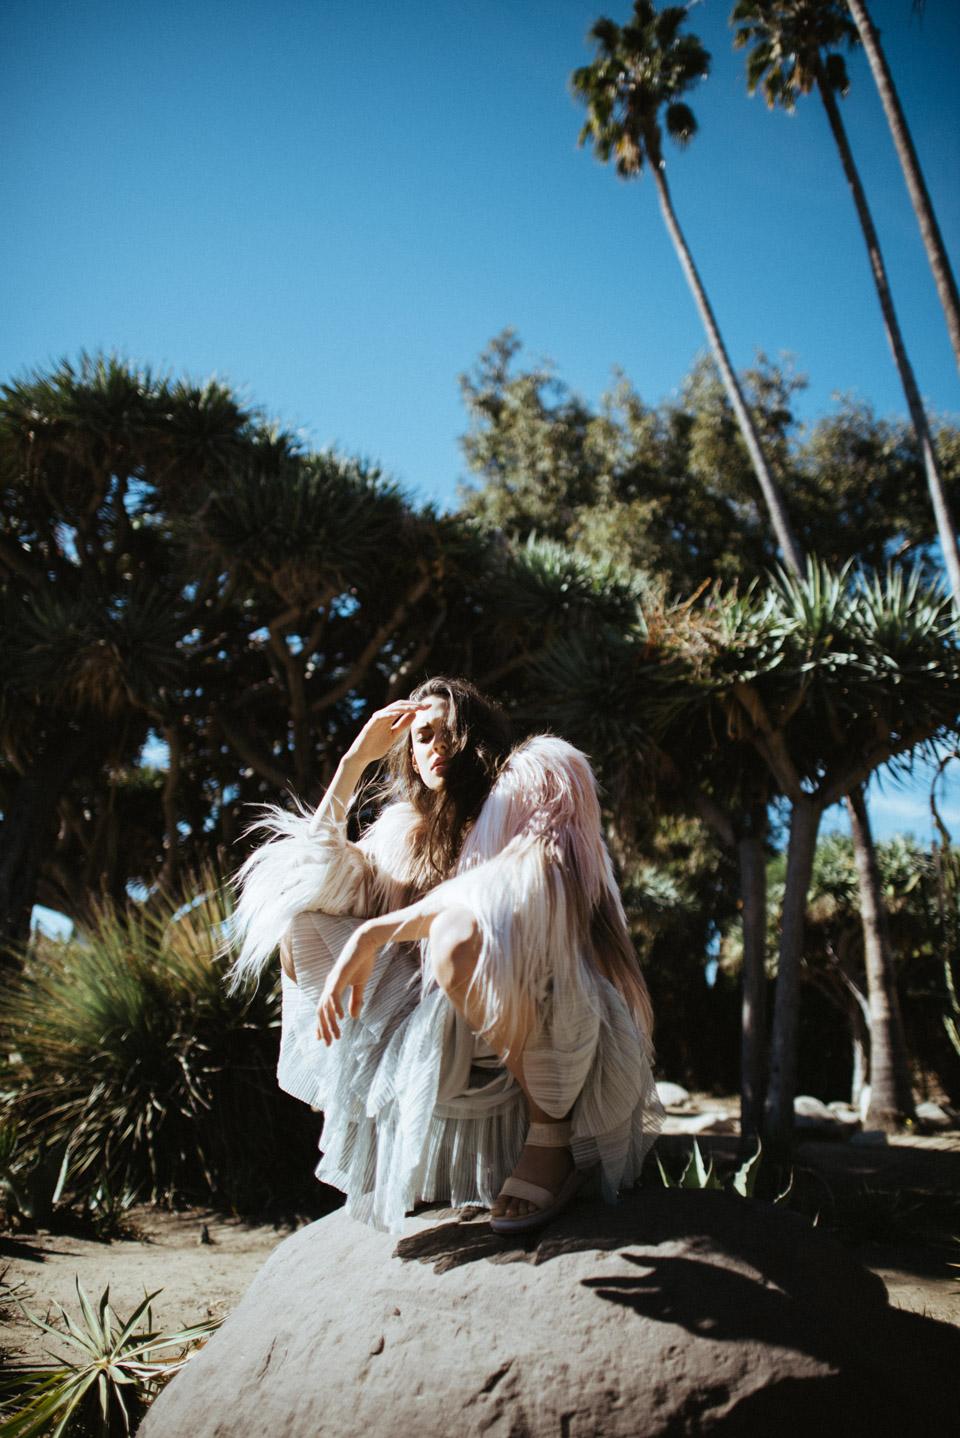 erika astrid fashion photographer and artist85.jpg